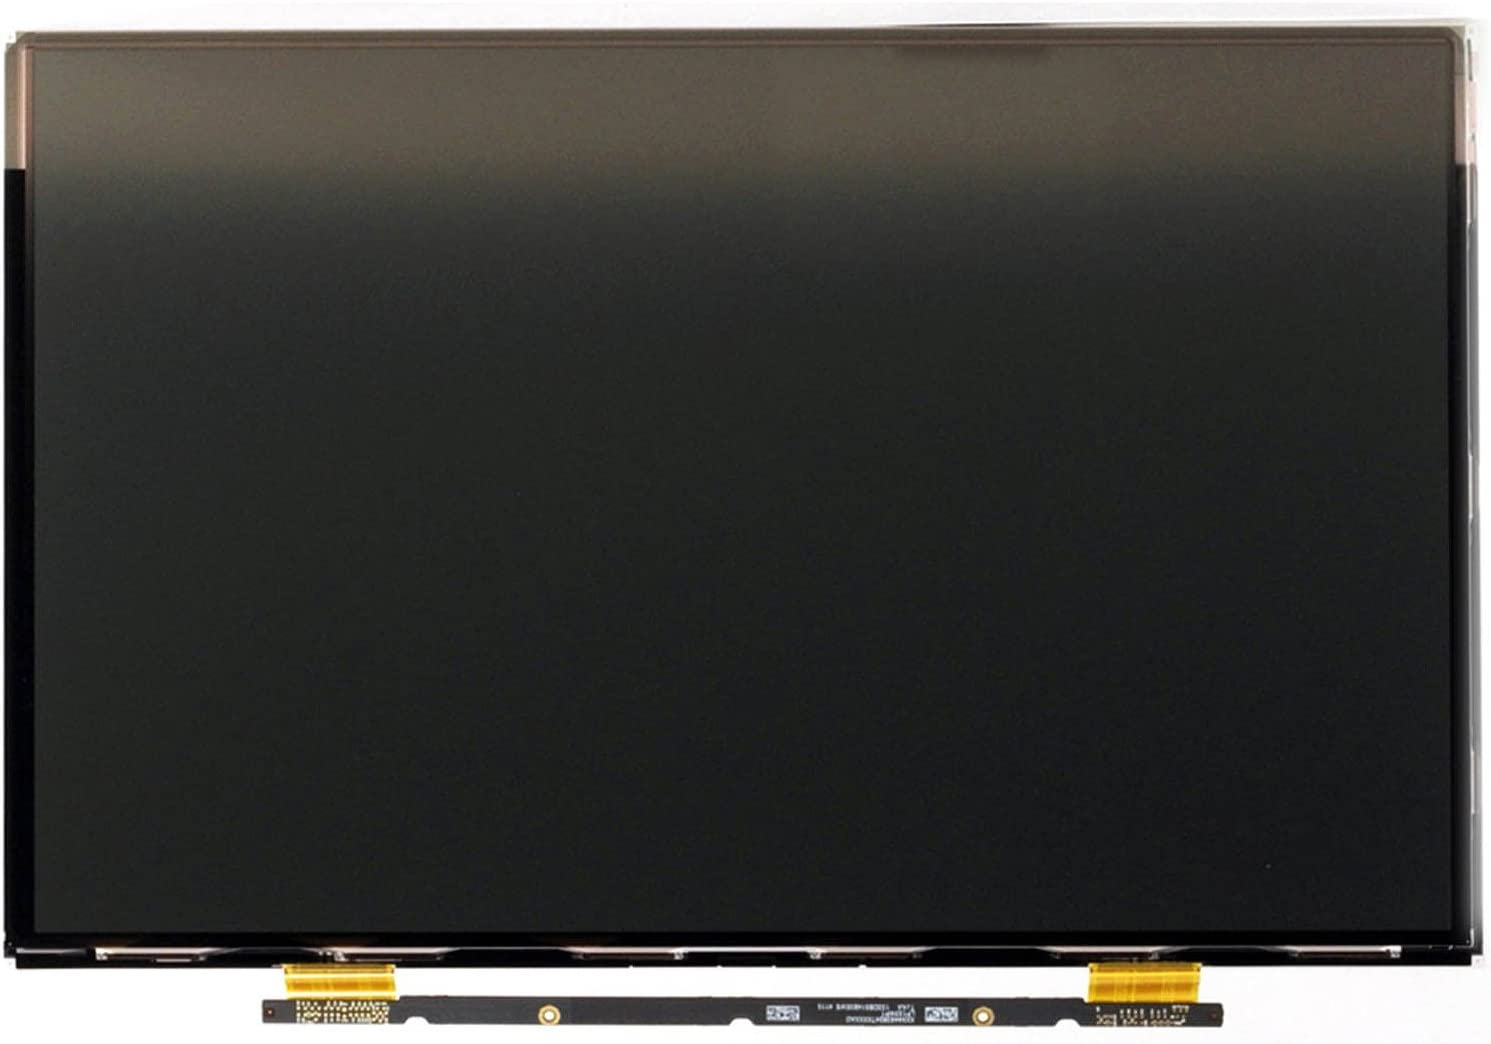 "MacBook Air 13/"" A1369 A1466 2010-2015 5 Pcs T5 Torx Battery Screw Set"